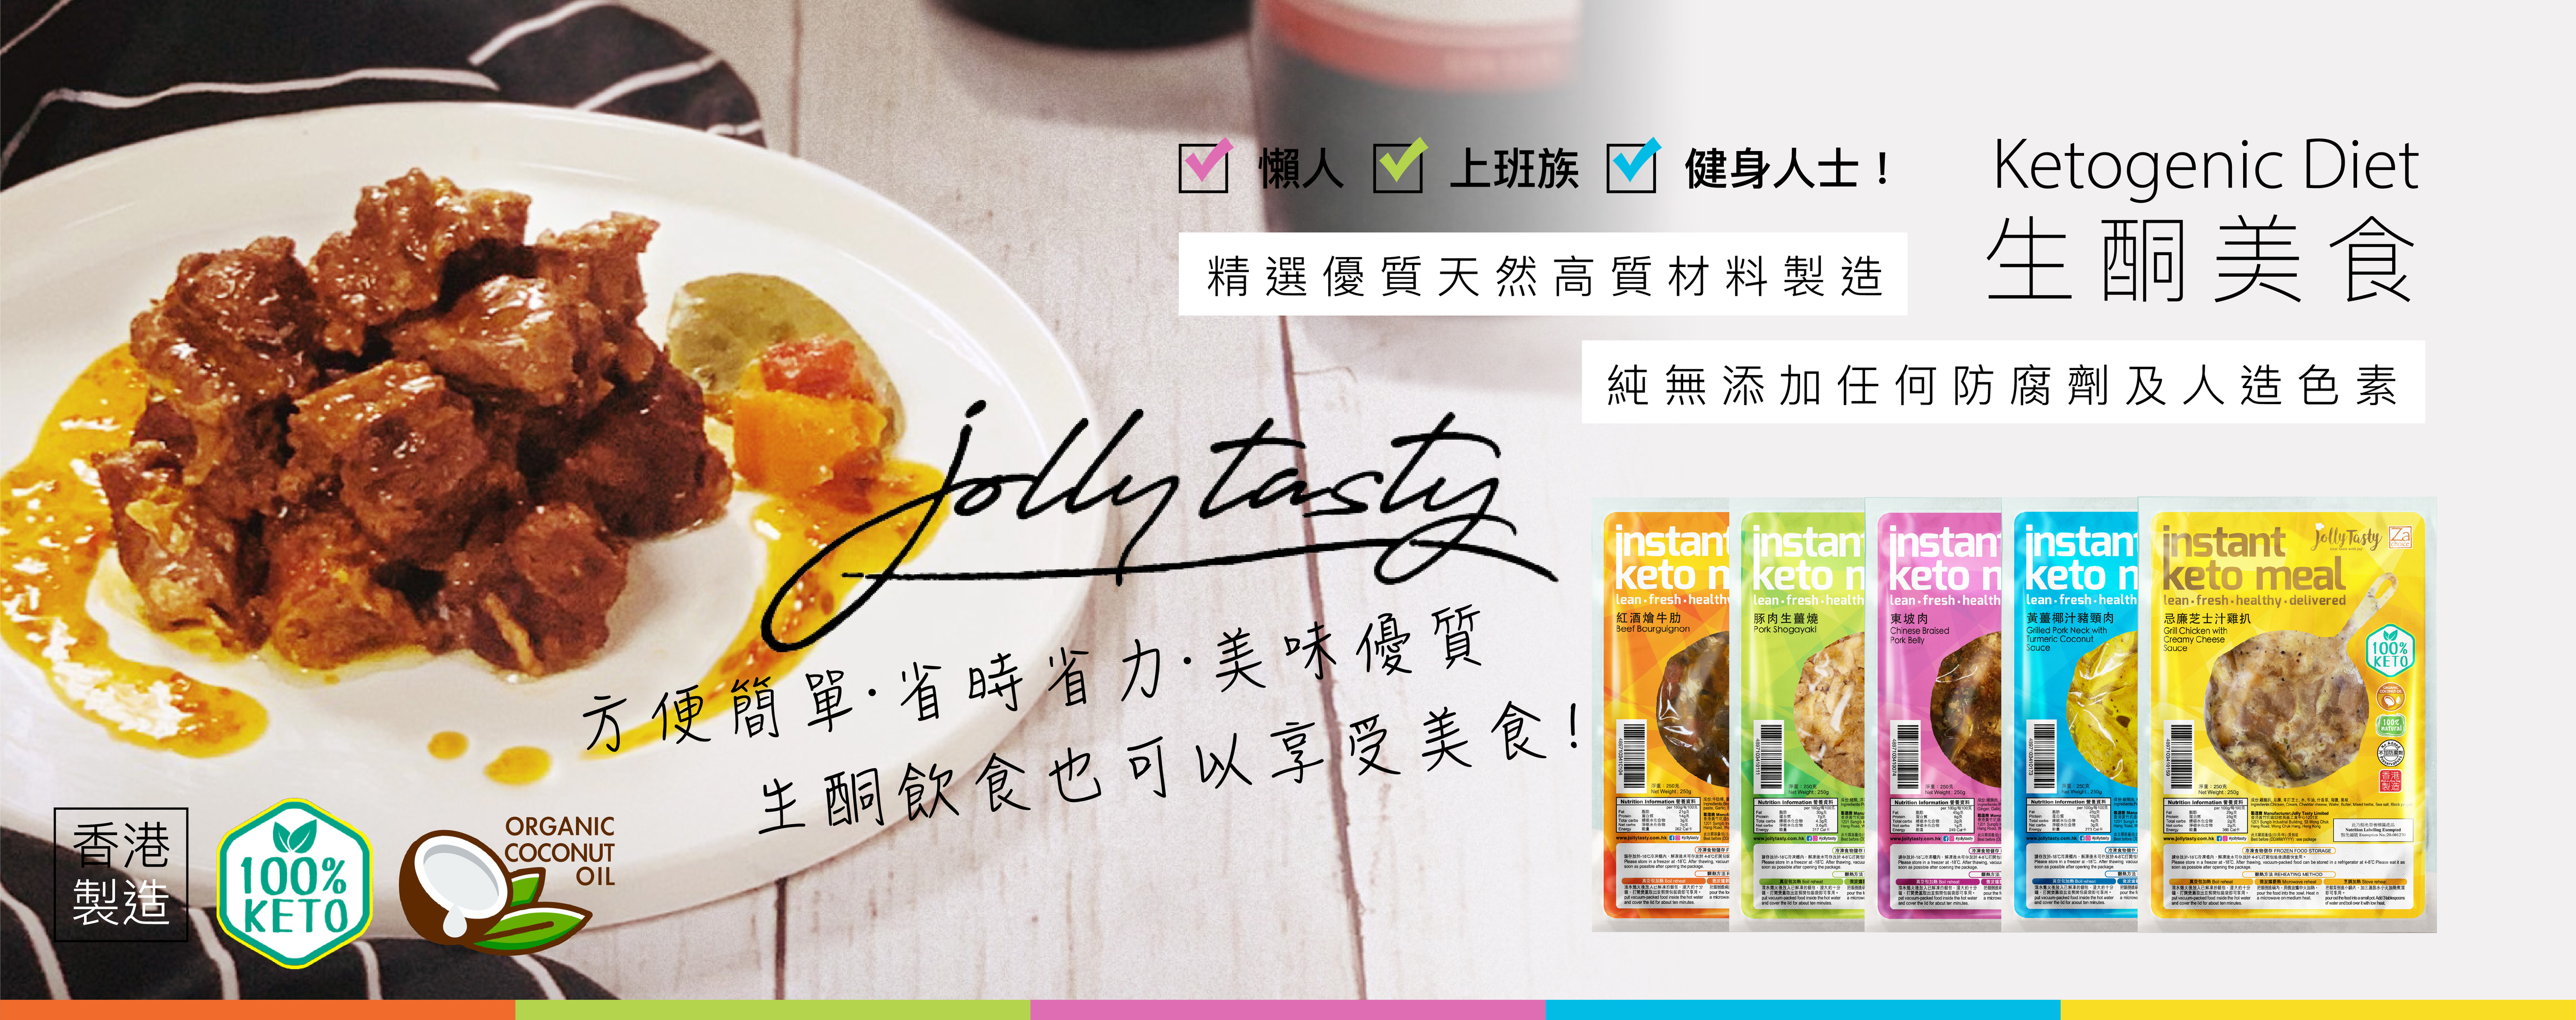 Jolly Tasty 生酮方便餸包